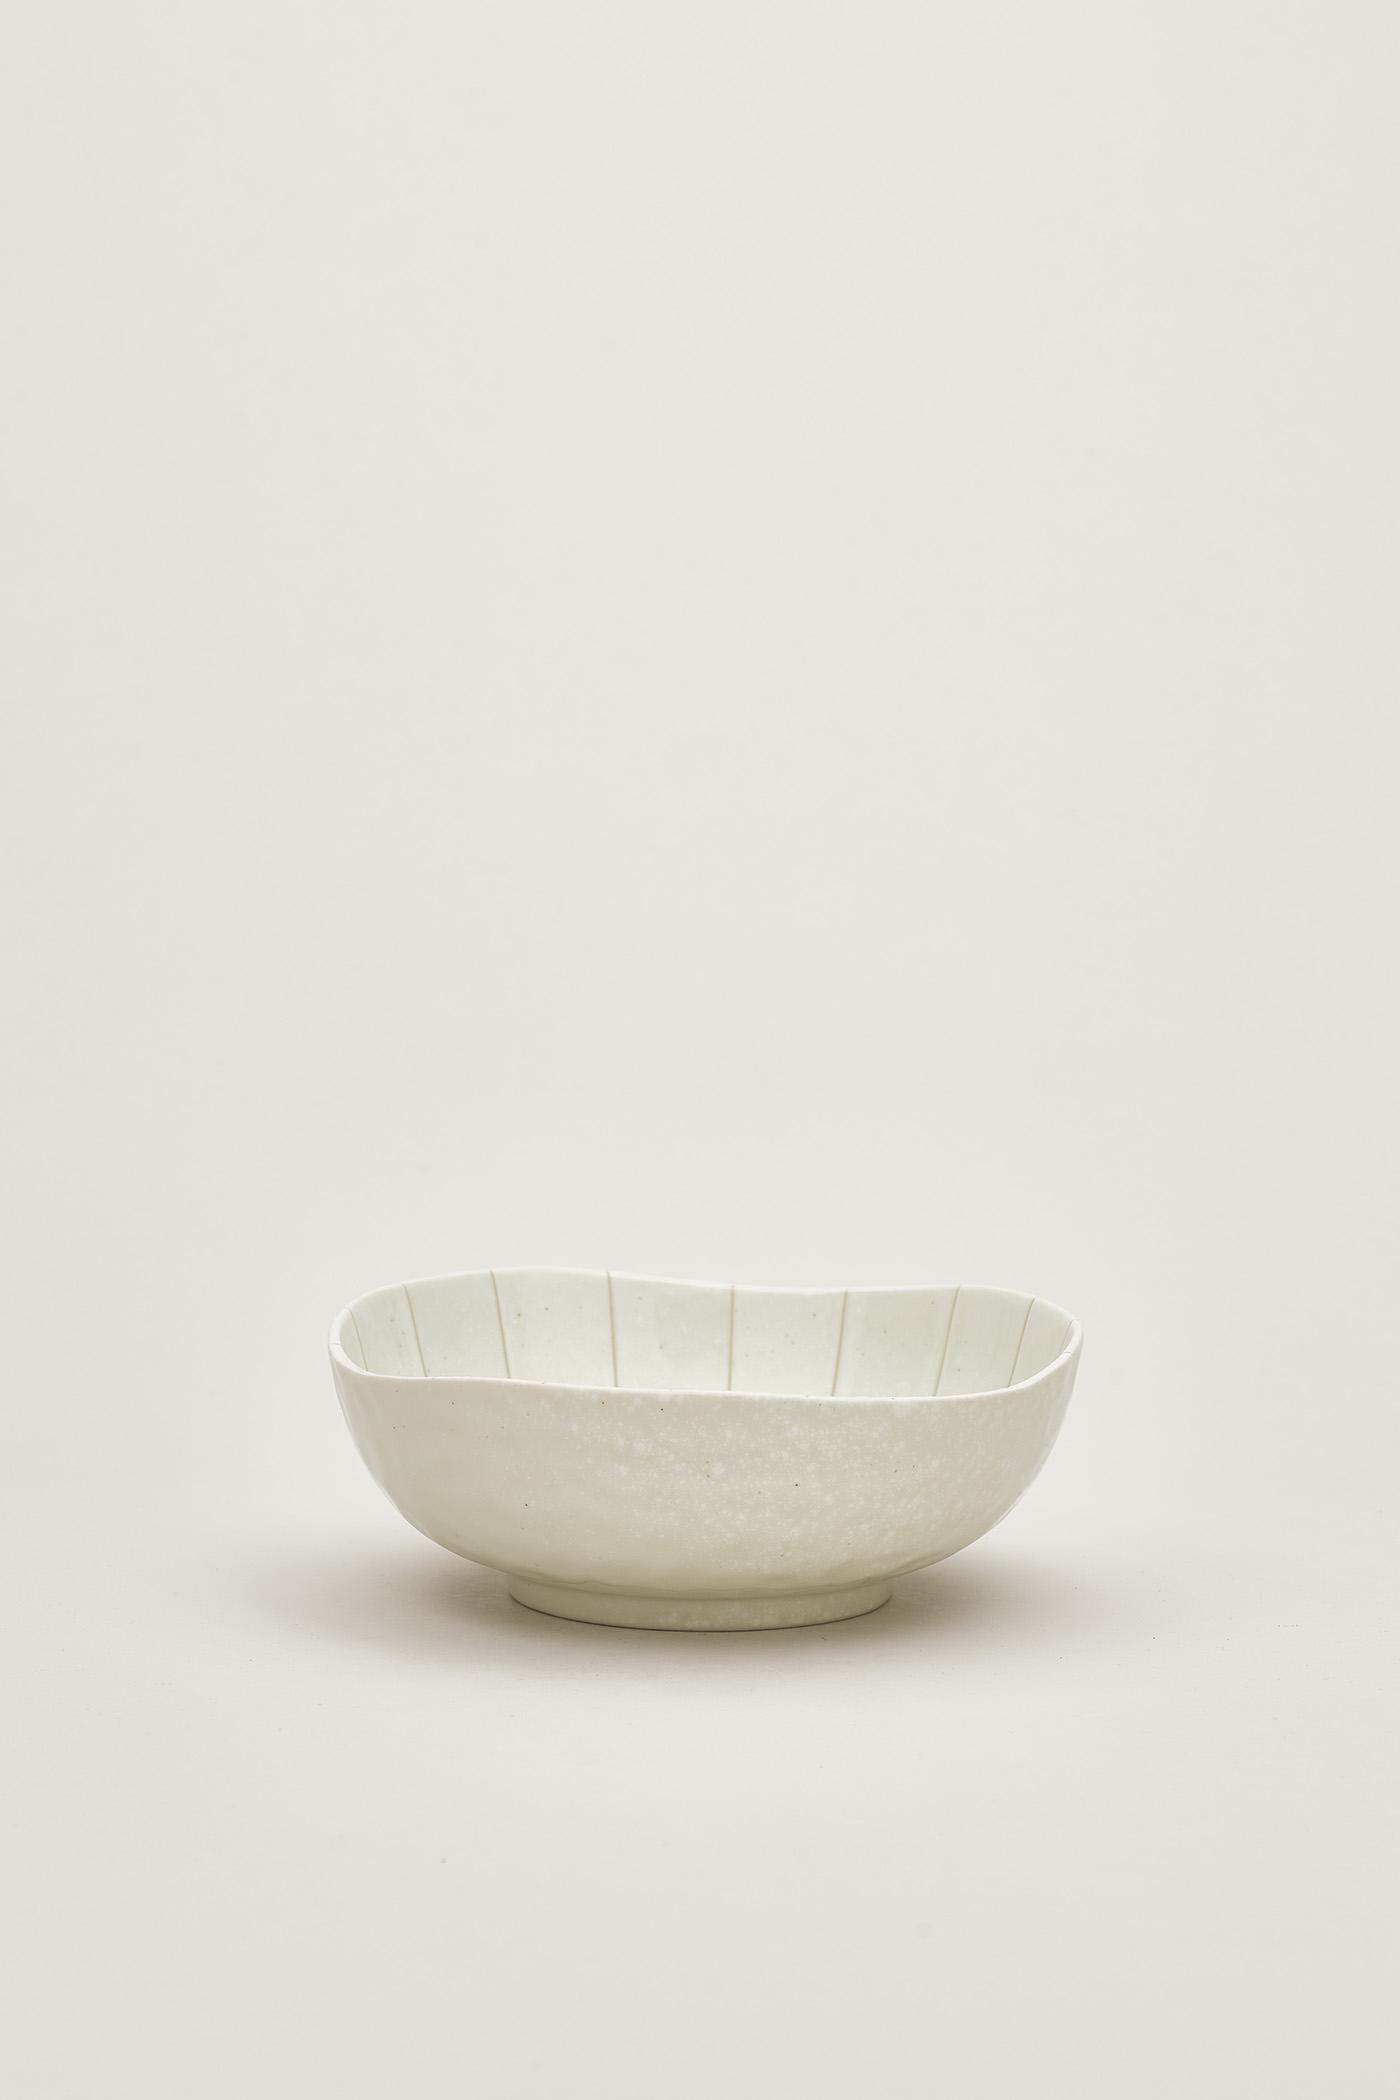 Chizu Large Bowl